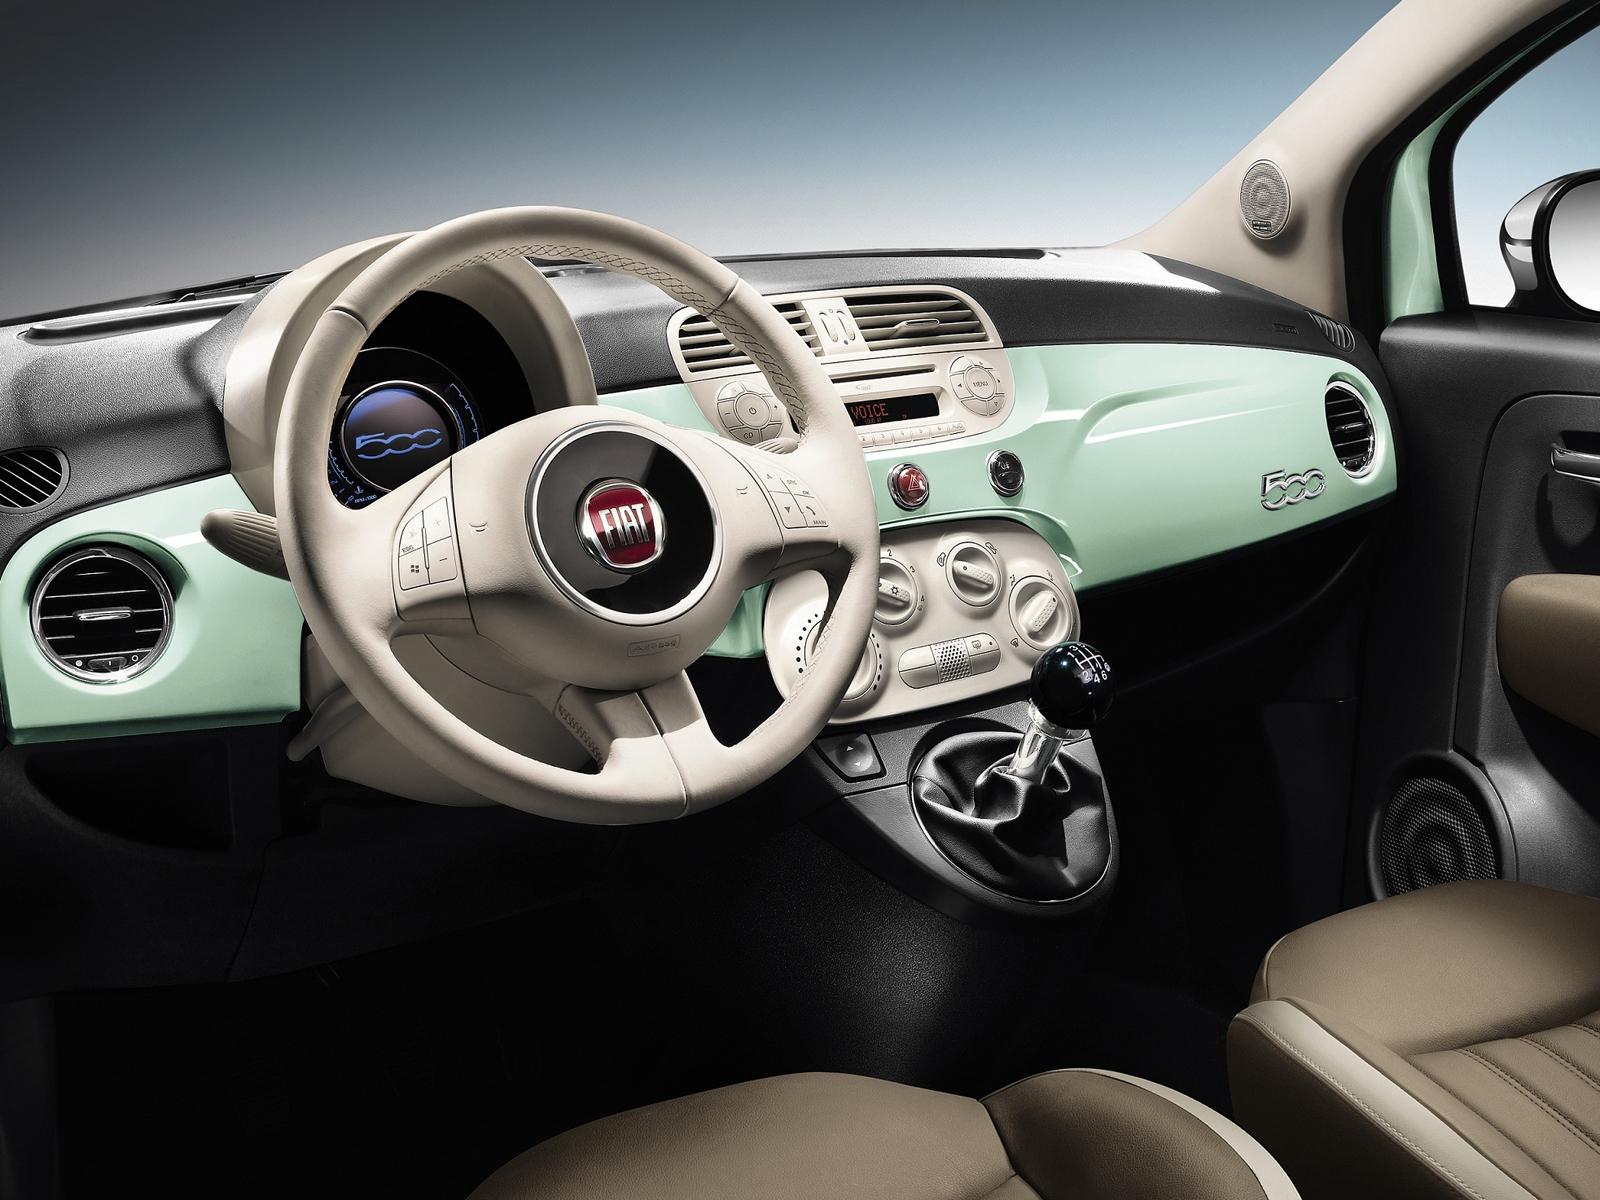 Fiat 500_1.jpg